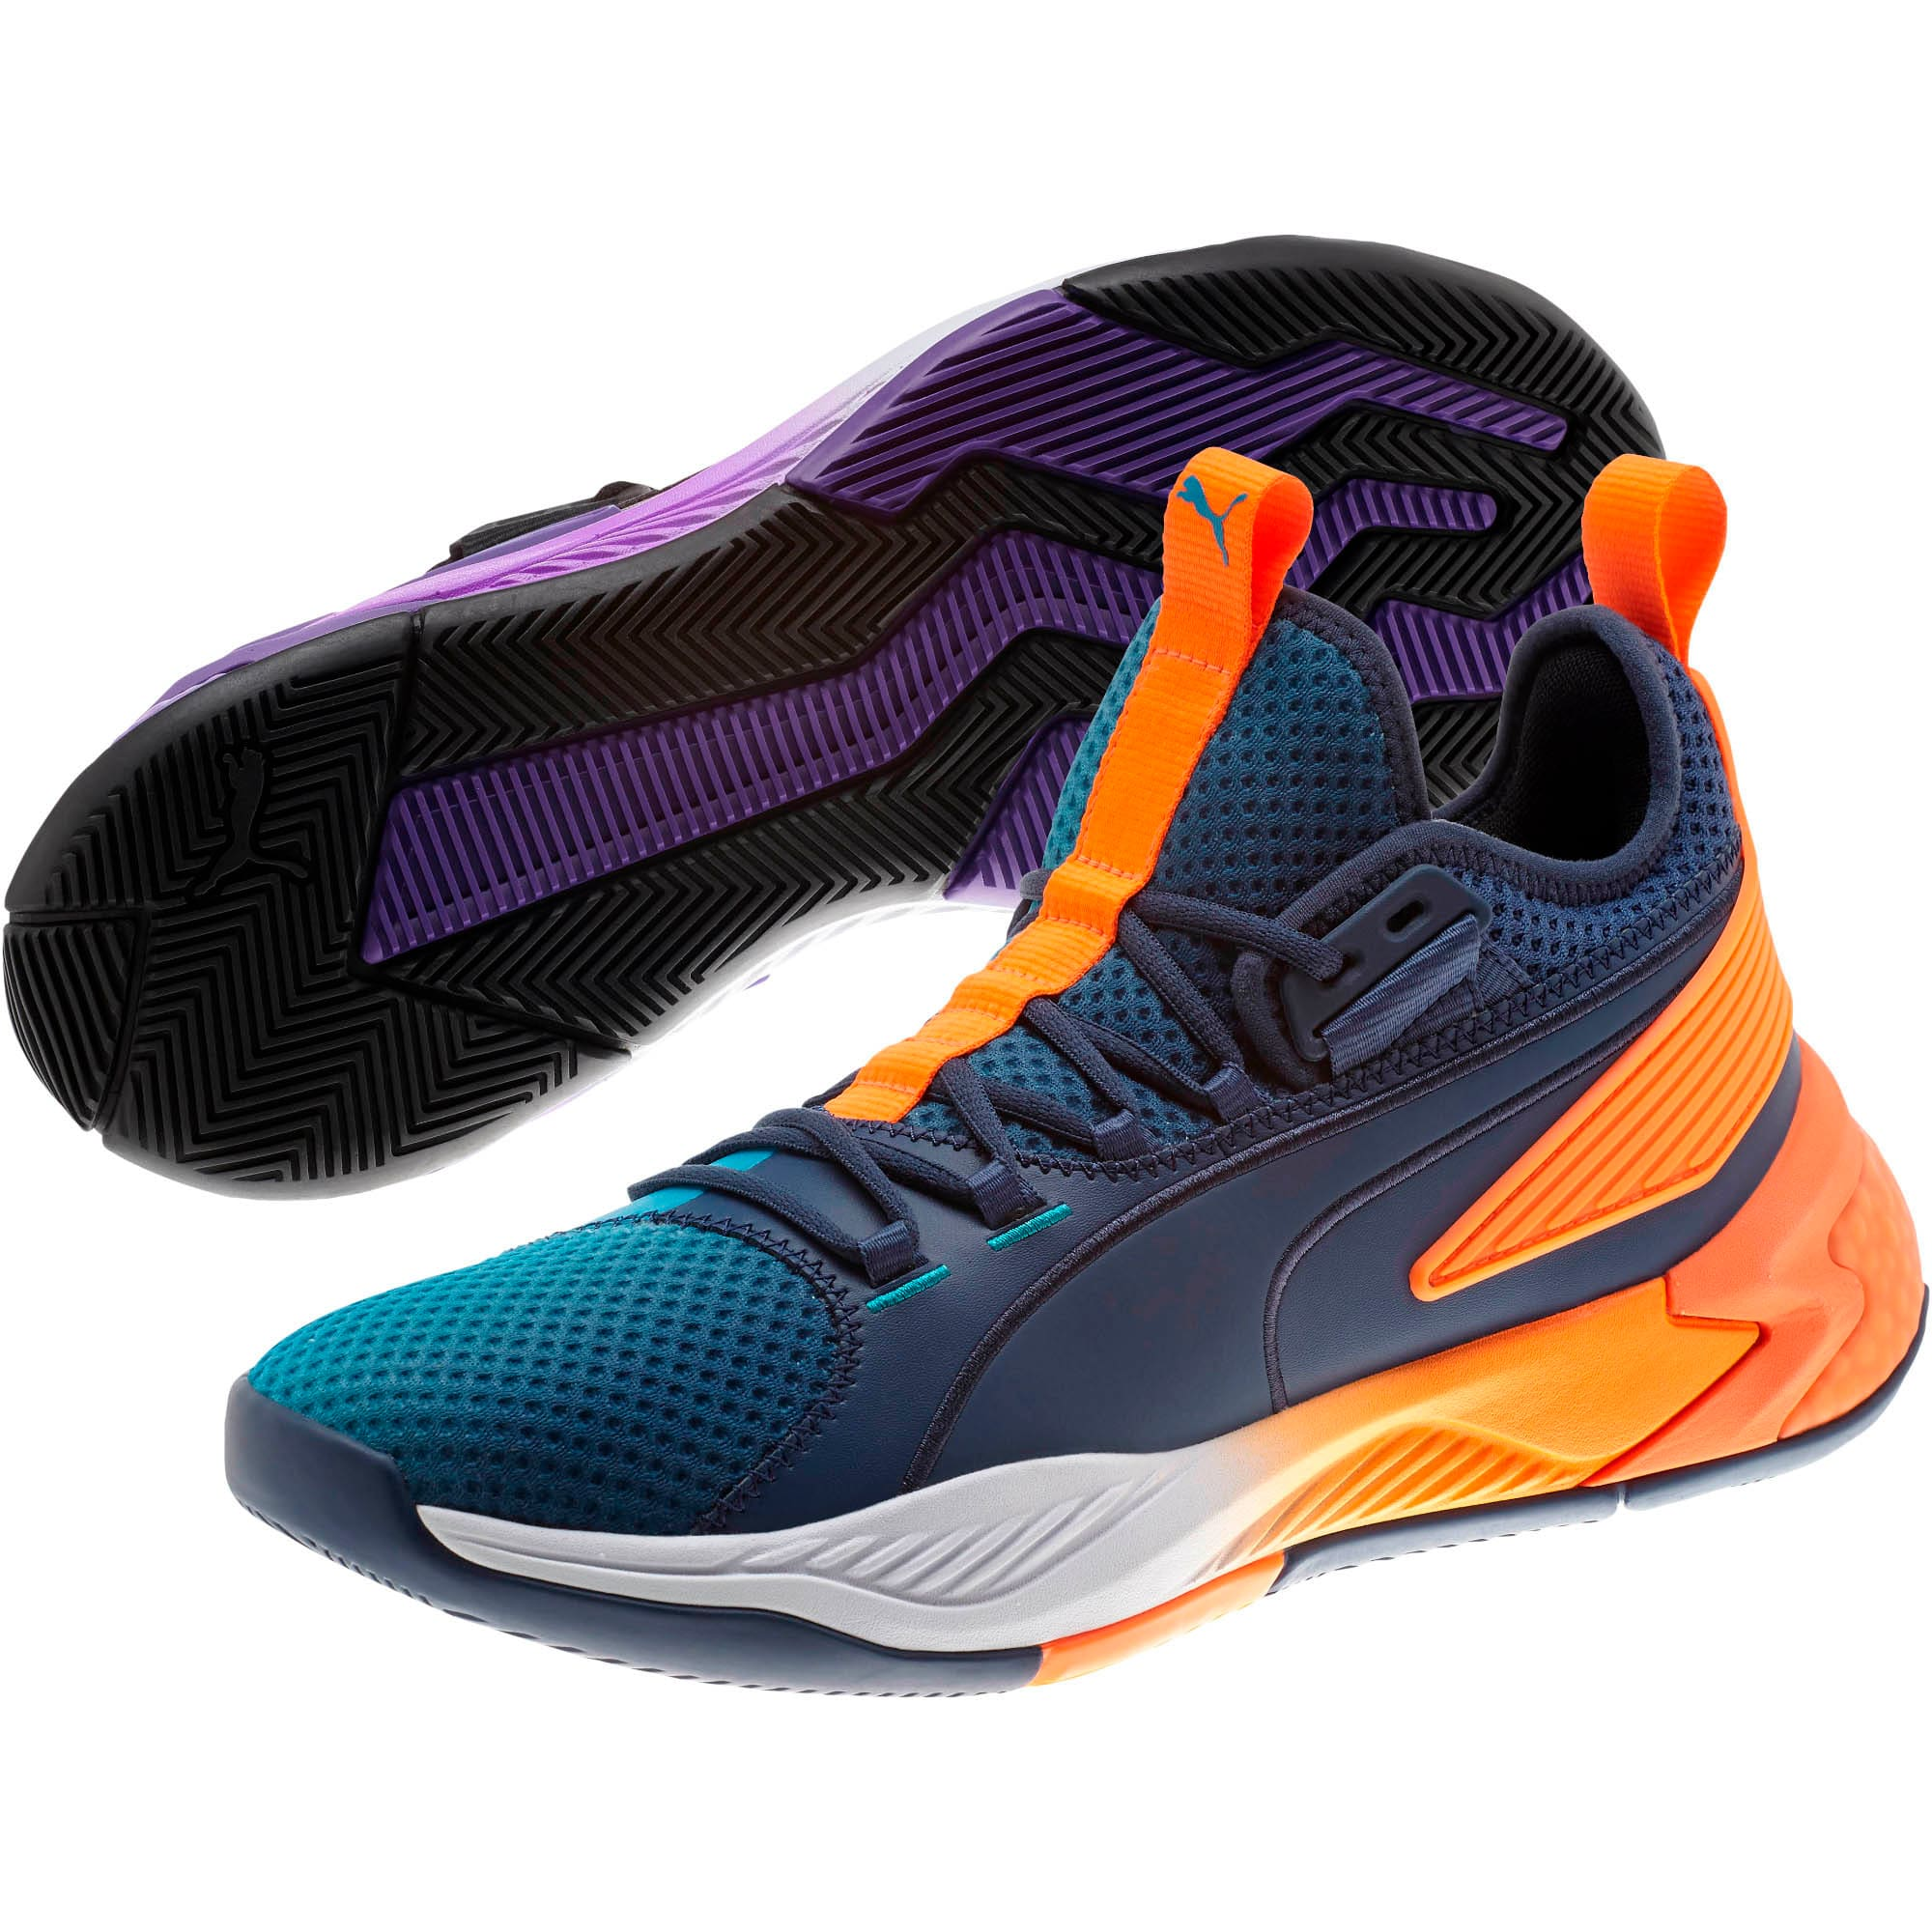 Thumbnail 2 of Uproar Charlotte ASG Fade Basketball Shoes, Orange- PURPLE, medium